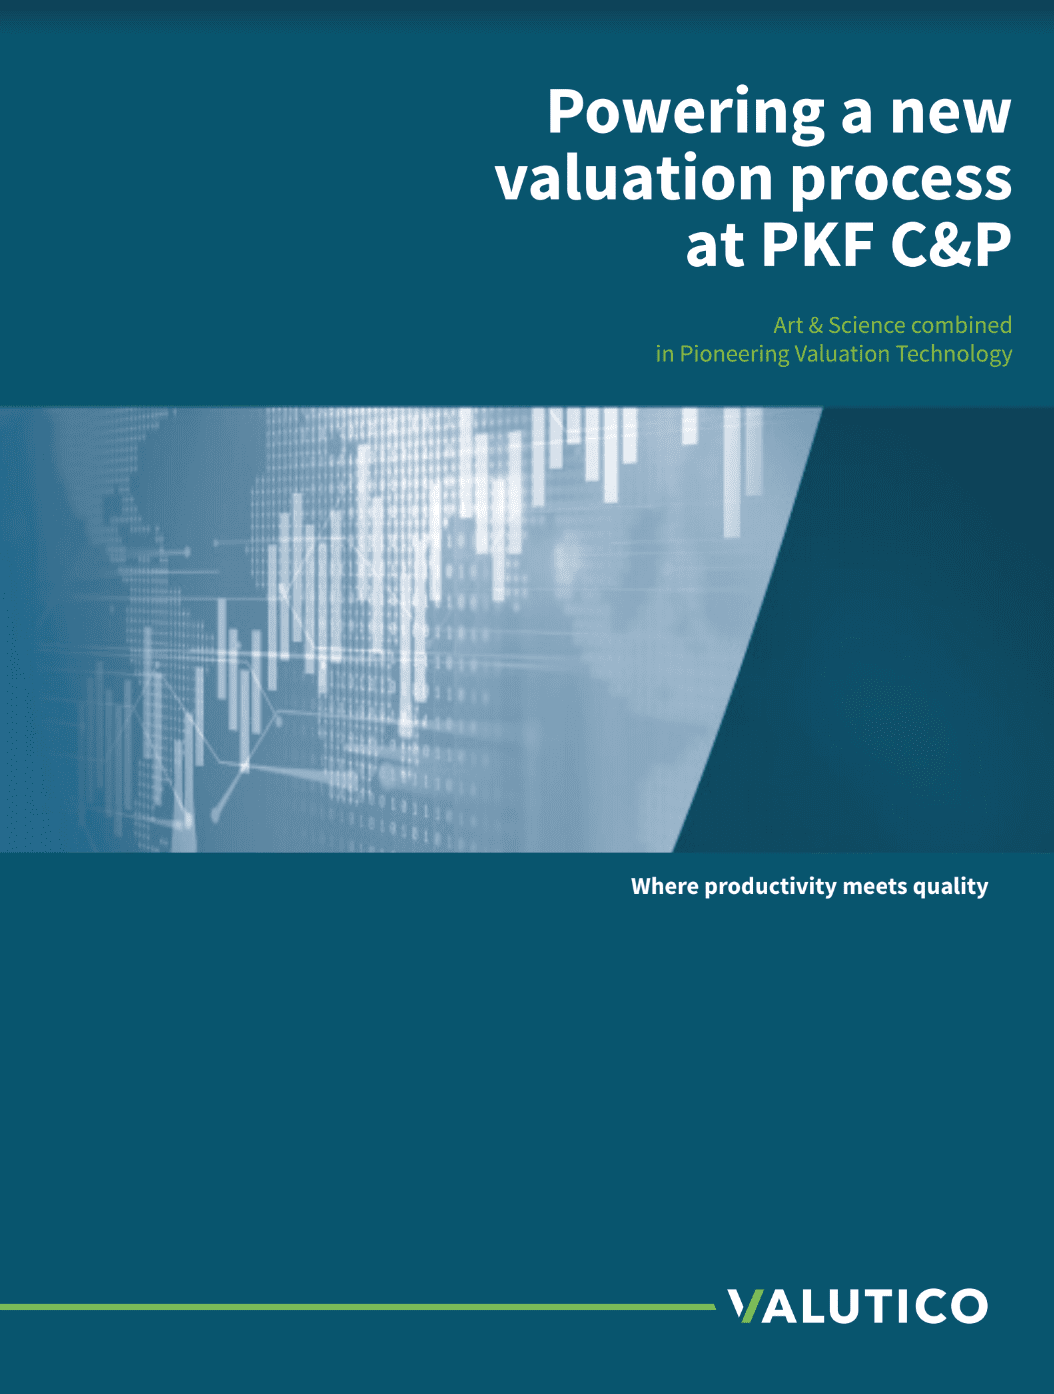 Estudio de caso de PKF C&P